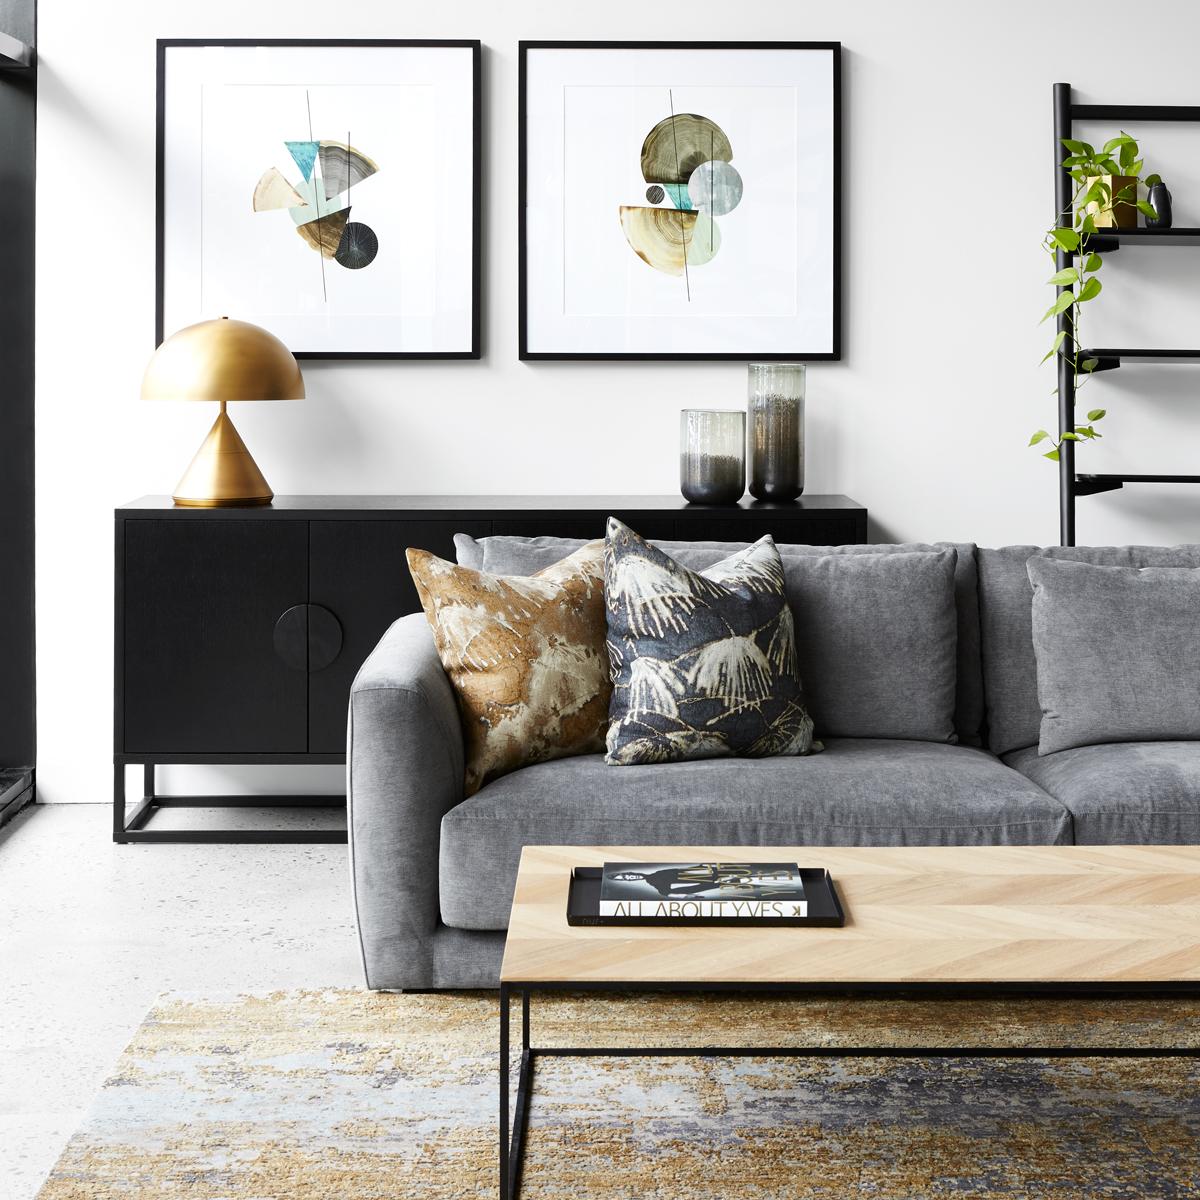 Retail Store Storage Furniture Design Of Mud Australia: Most Wanted